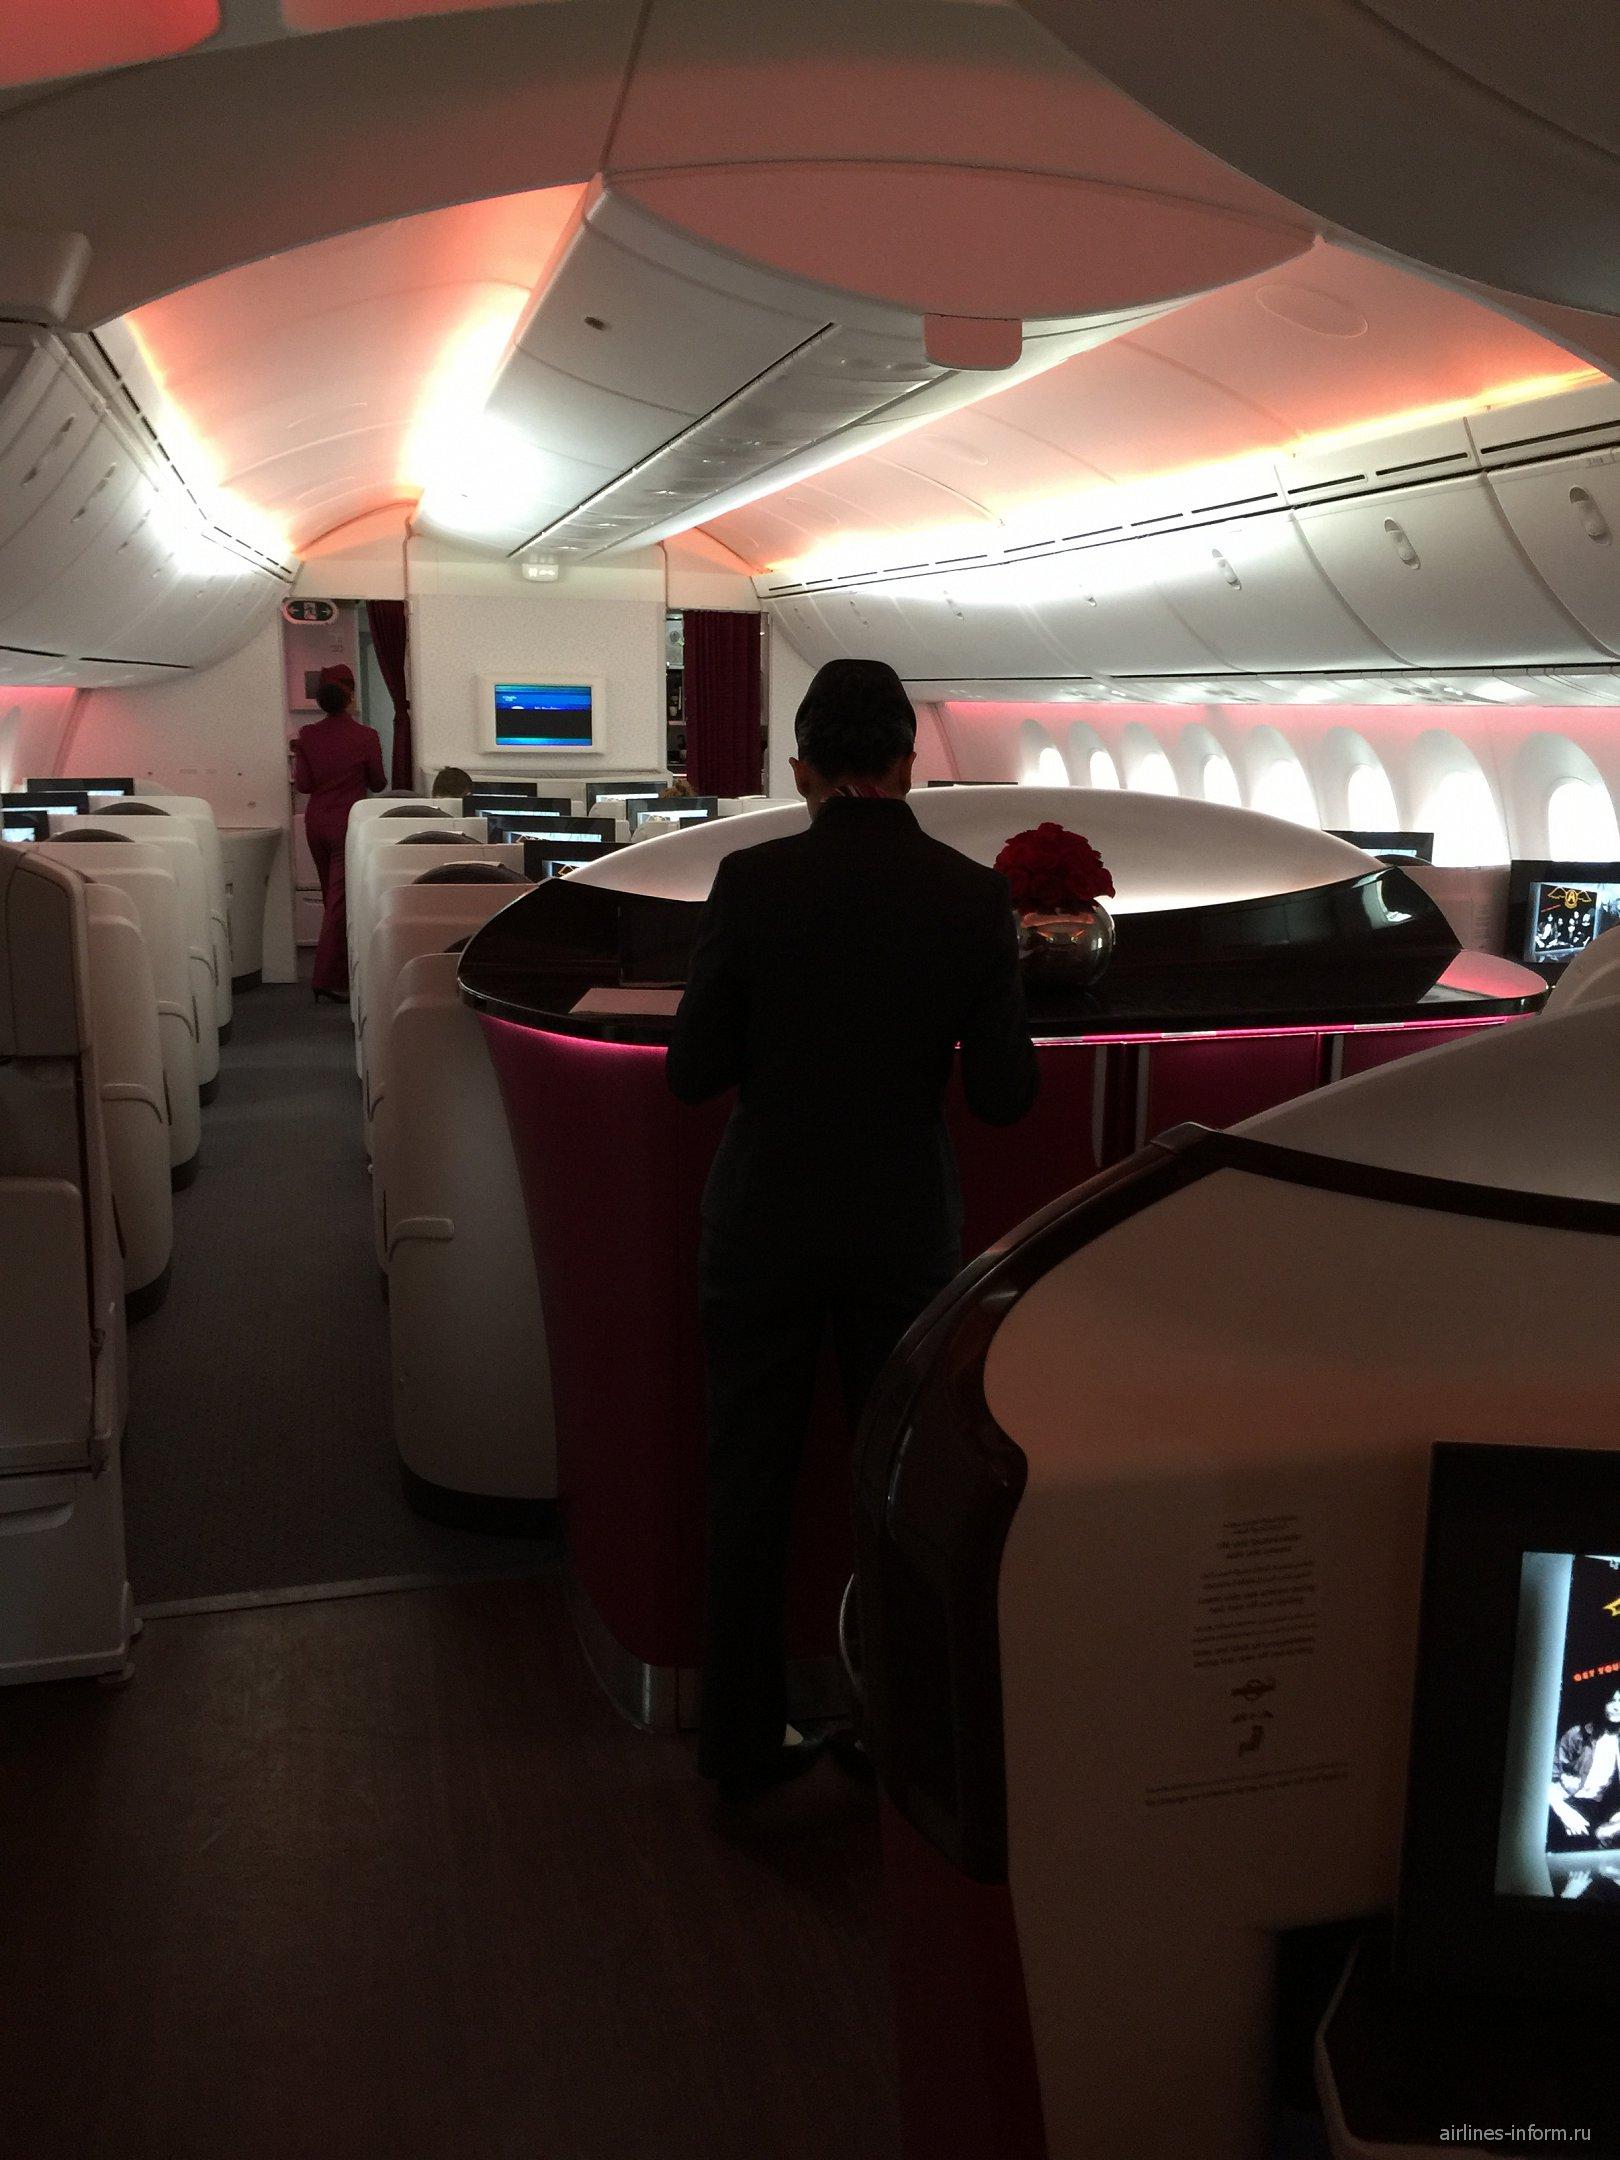 Салон бизнес-класса в самолете Боинг-787-8 Катарских авиалиний